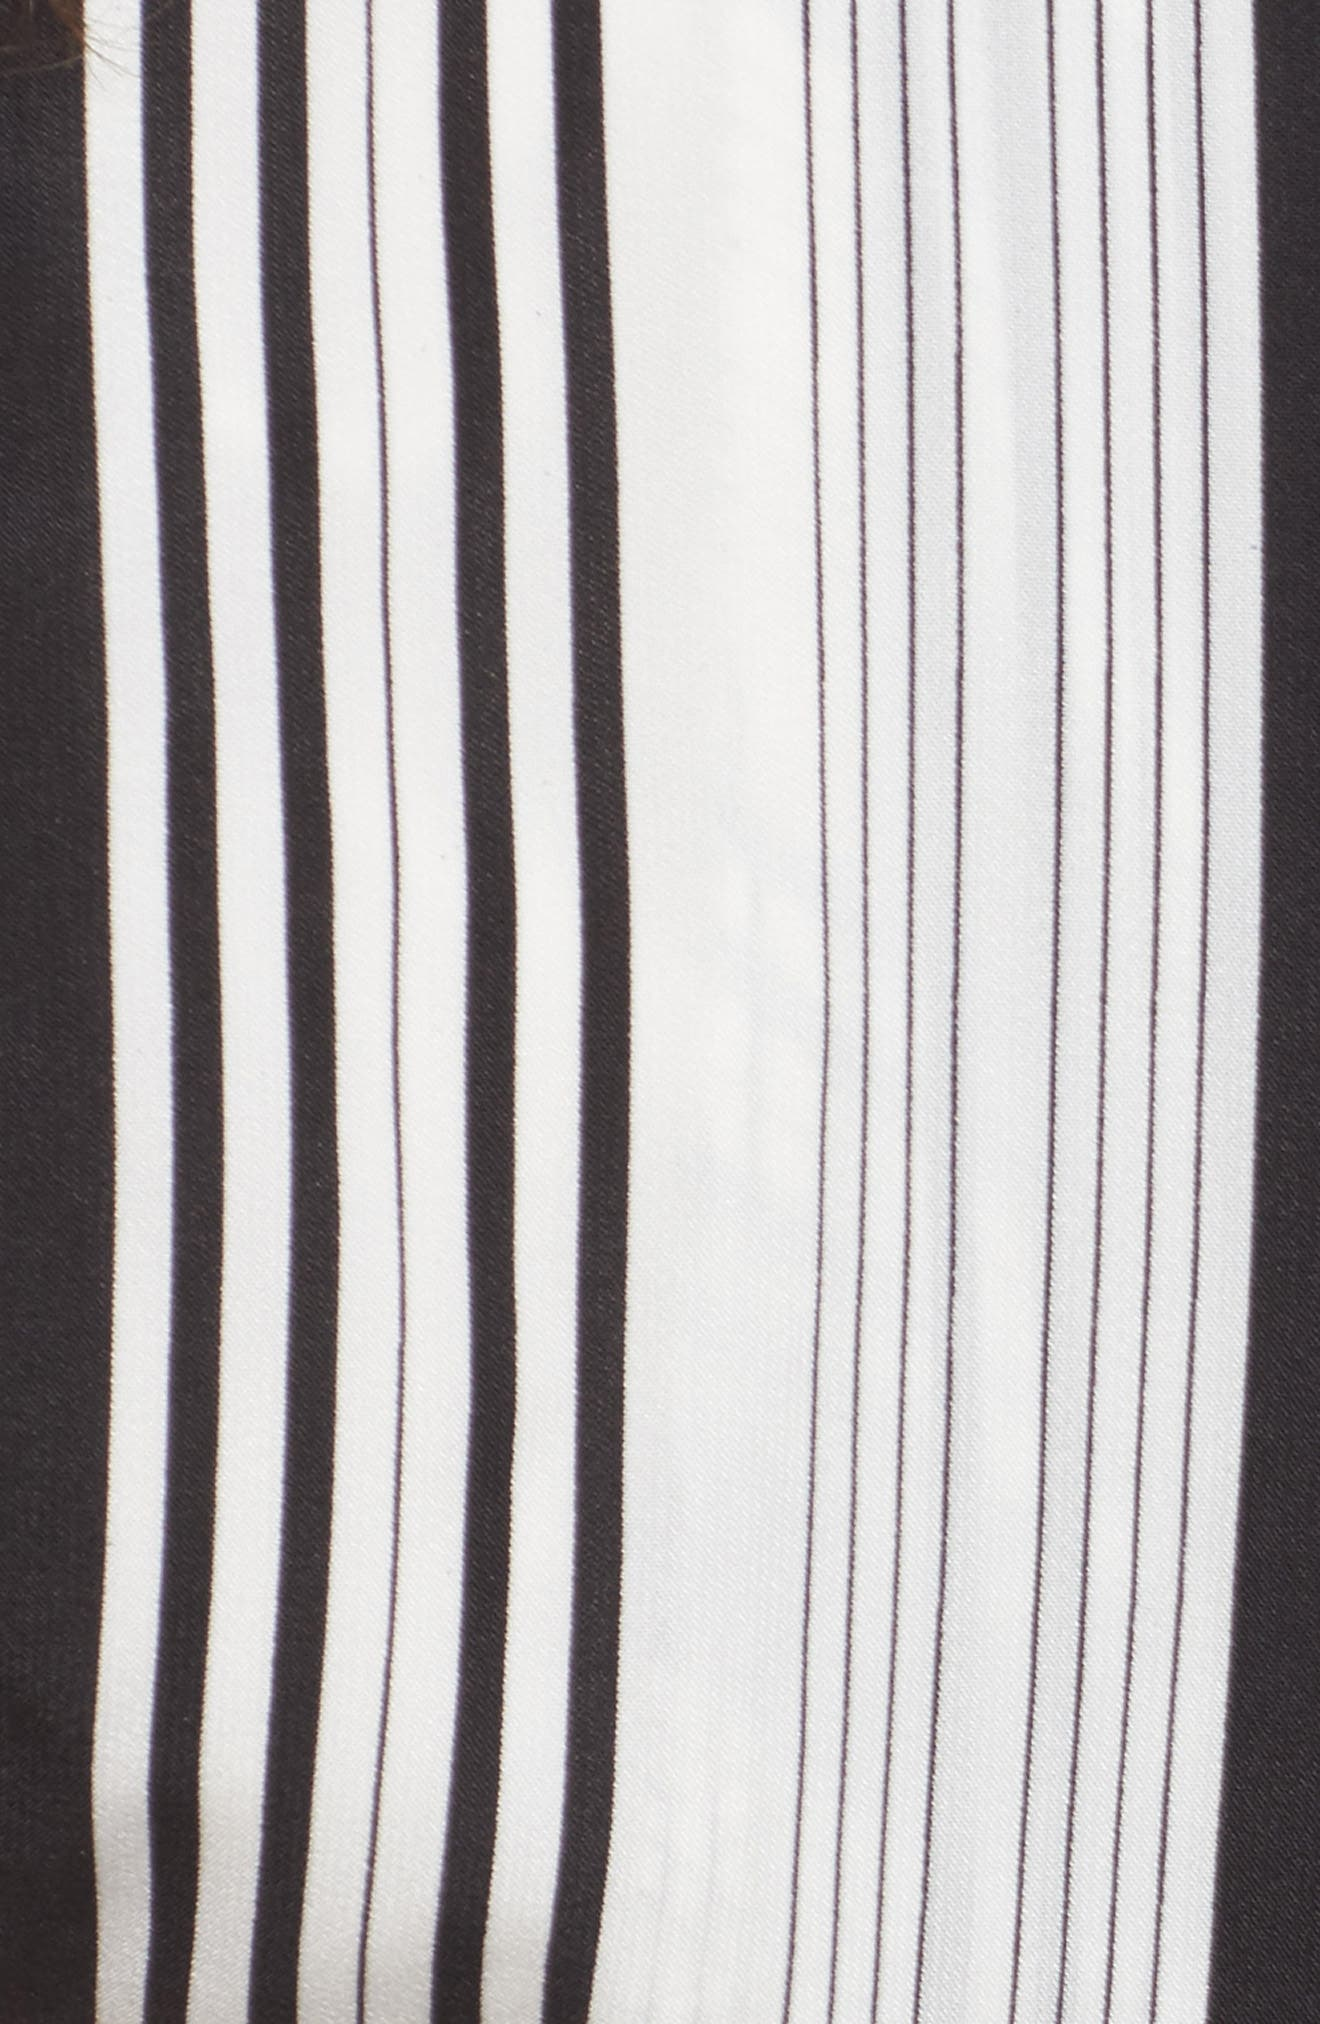 One-Shoulder Tie Waist Shirt,                             Alternate thumbnail 5, color,                             Black/ White Stripe